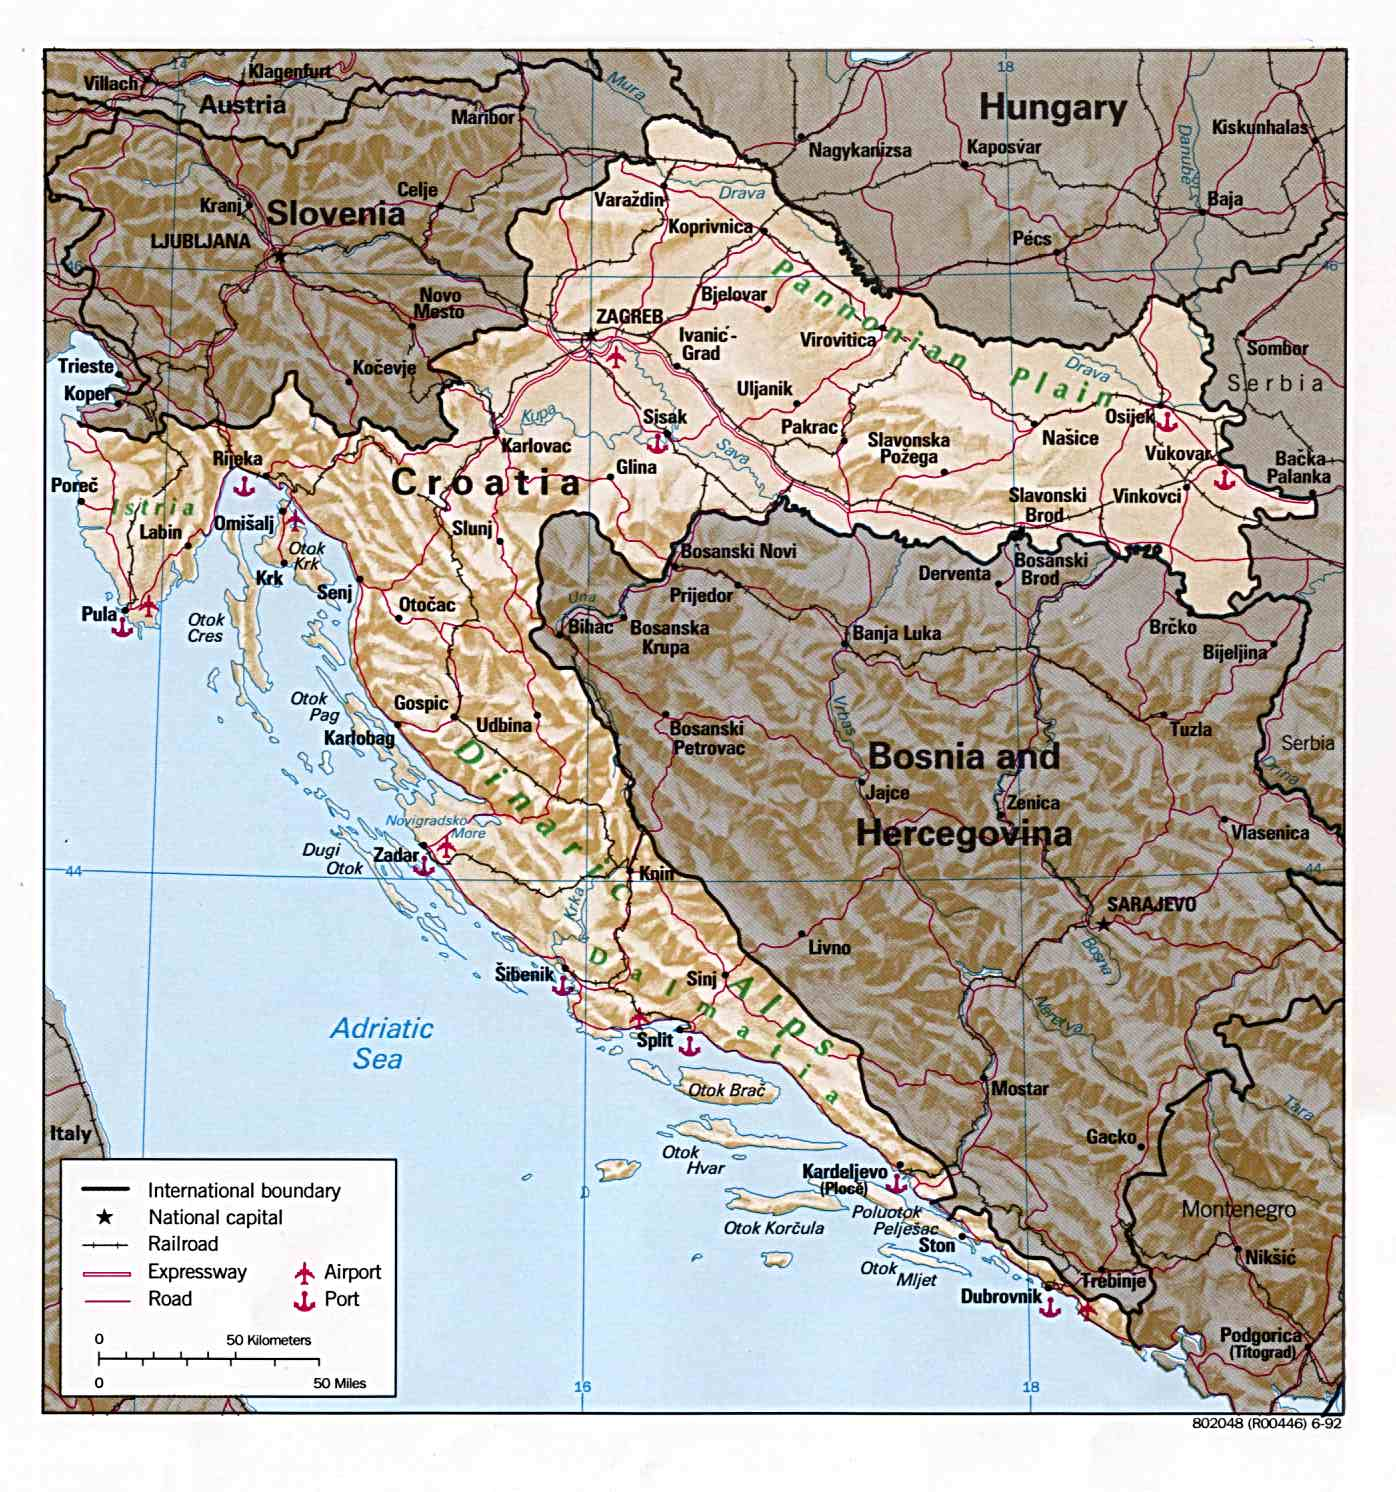 Croácia | Mapas Geográficos da Croácia